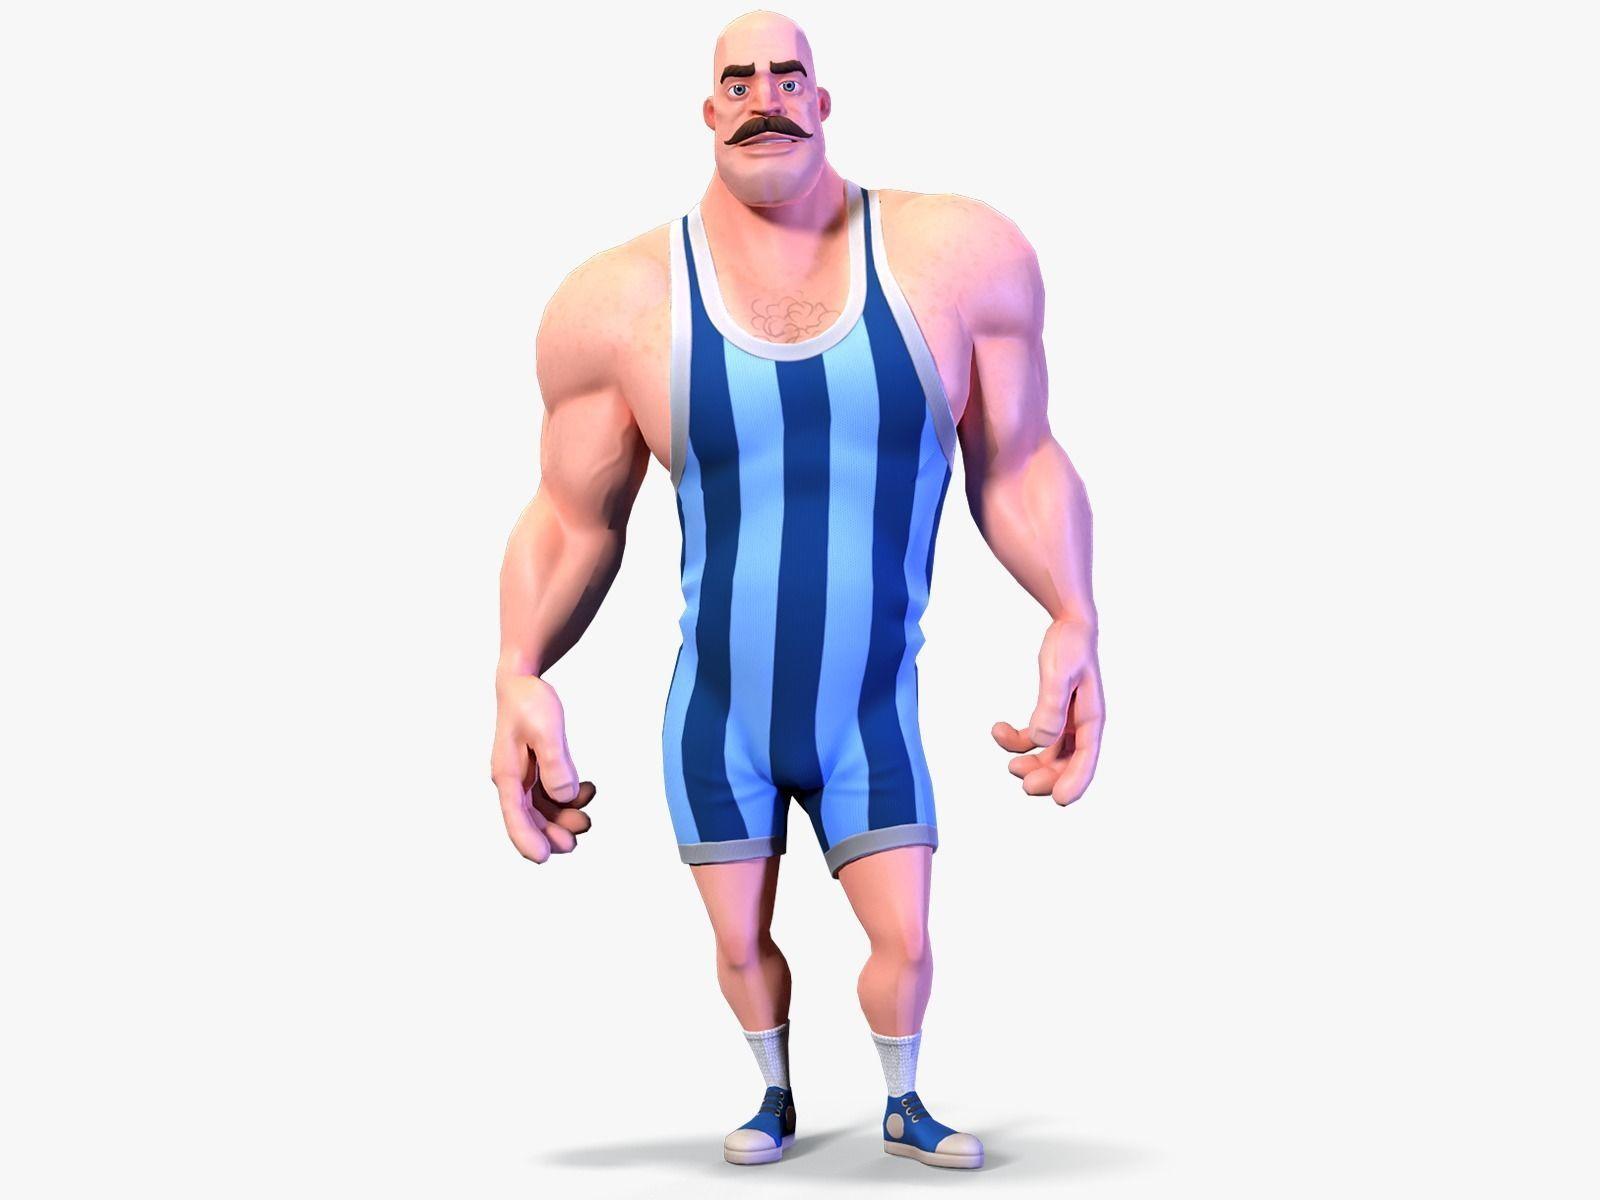 Stylized Rigged Athlete Man